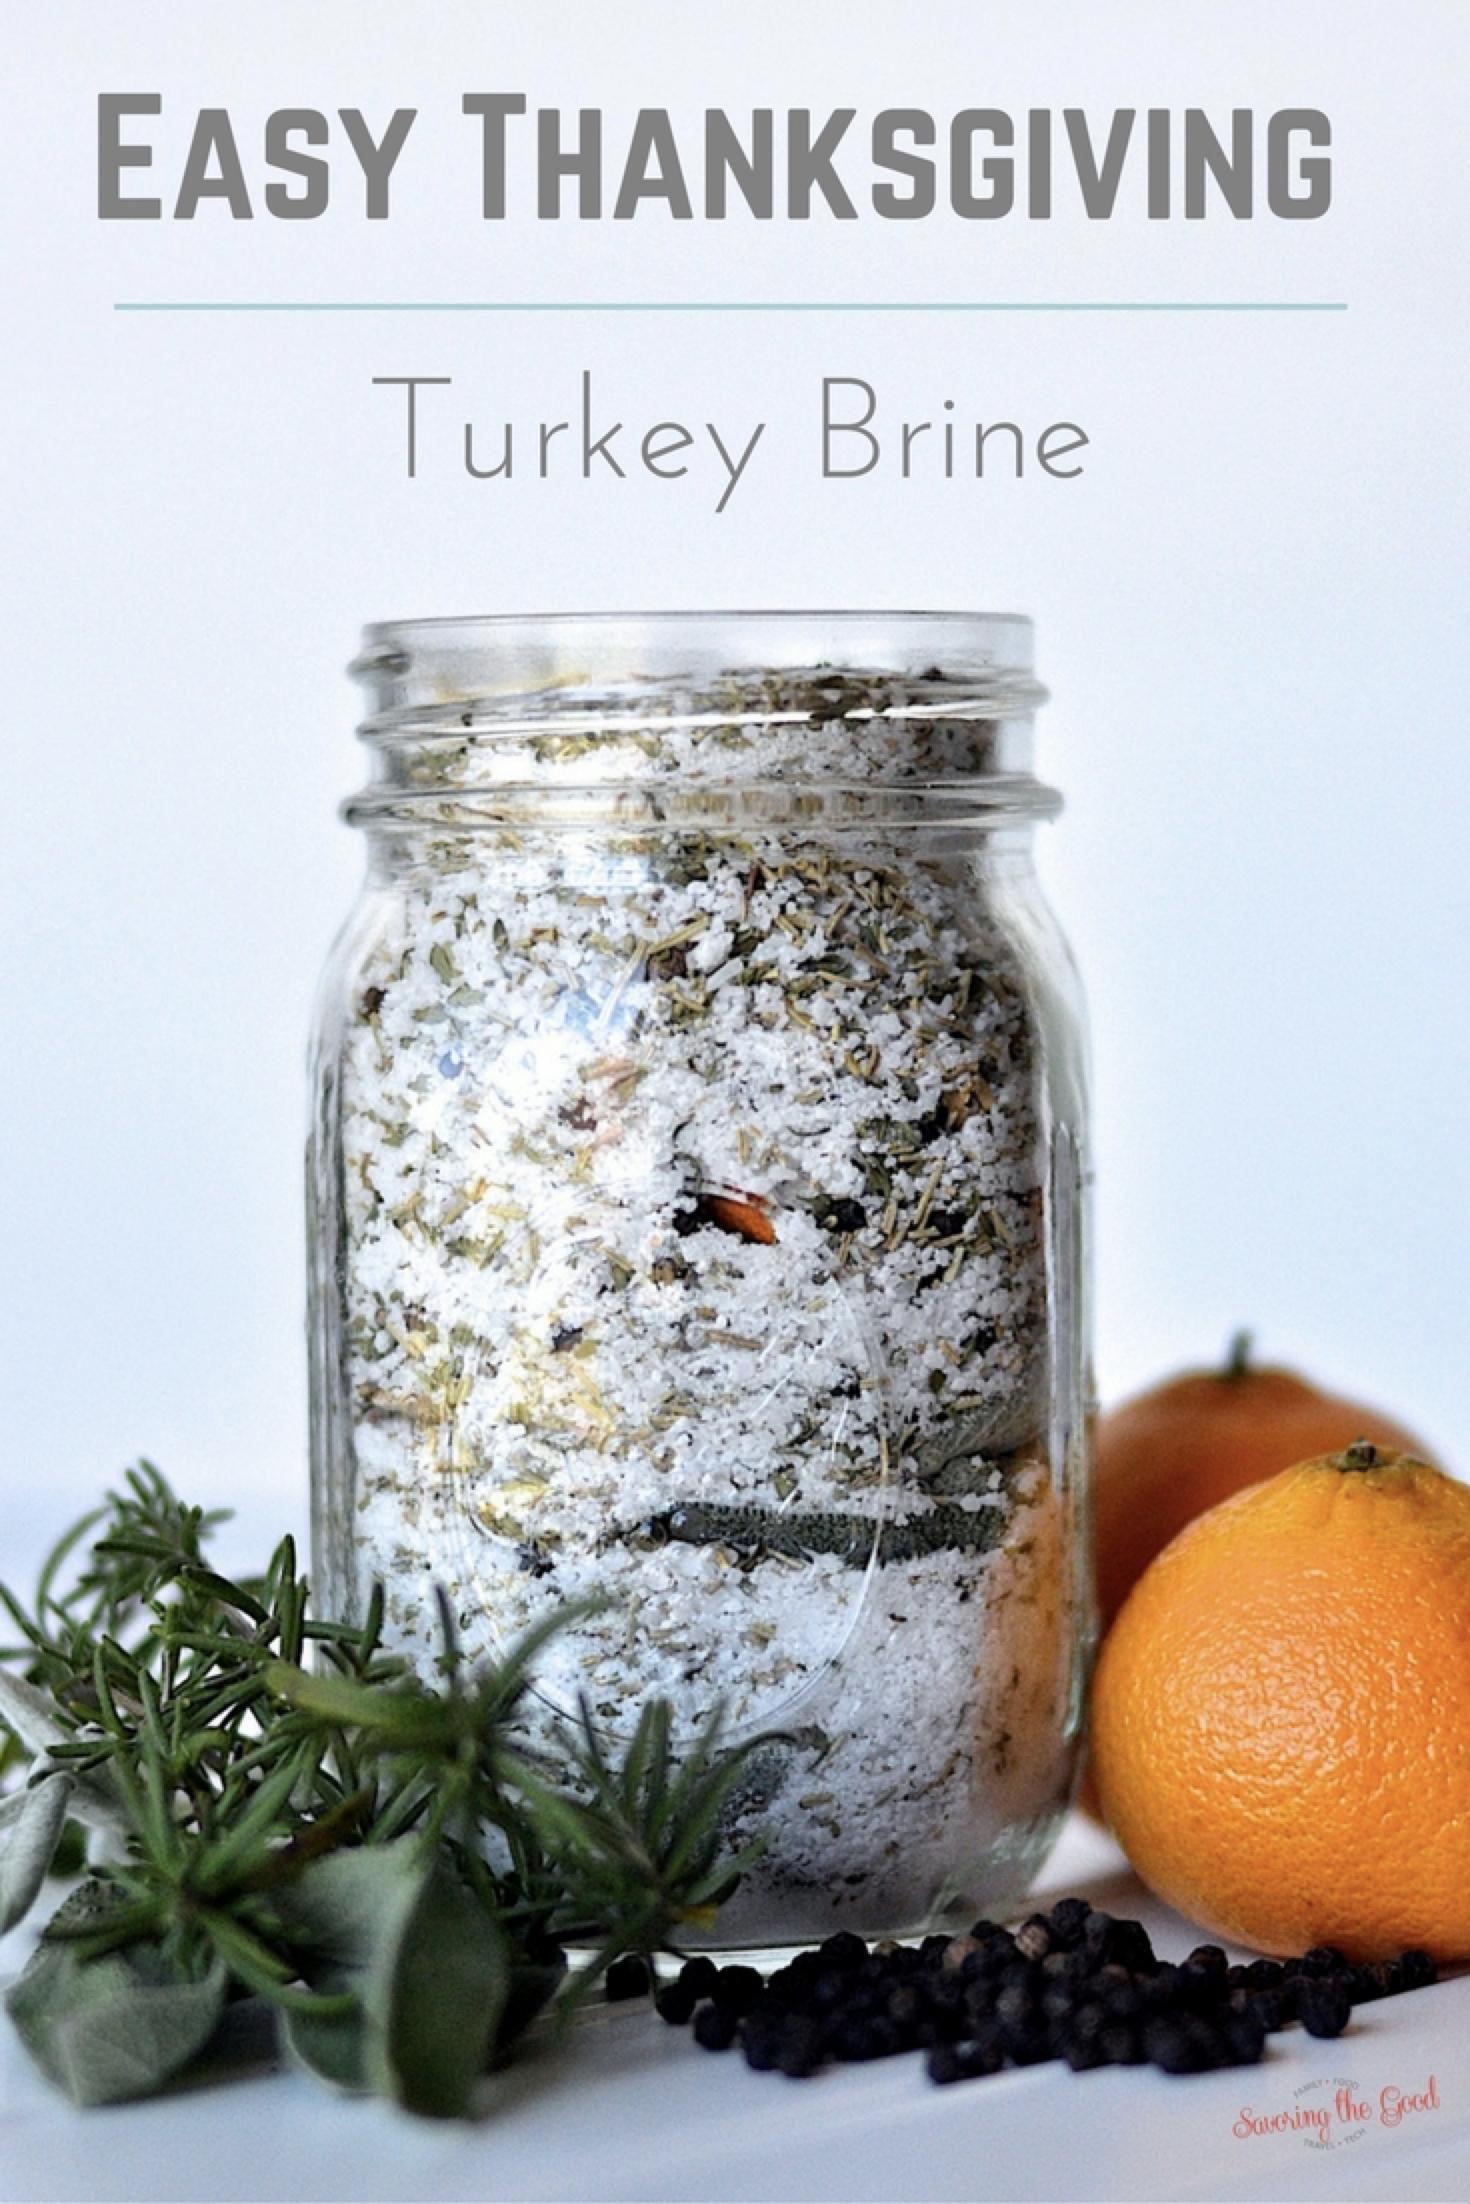 Turkey Brine Recipe | Savoring The Good